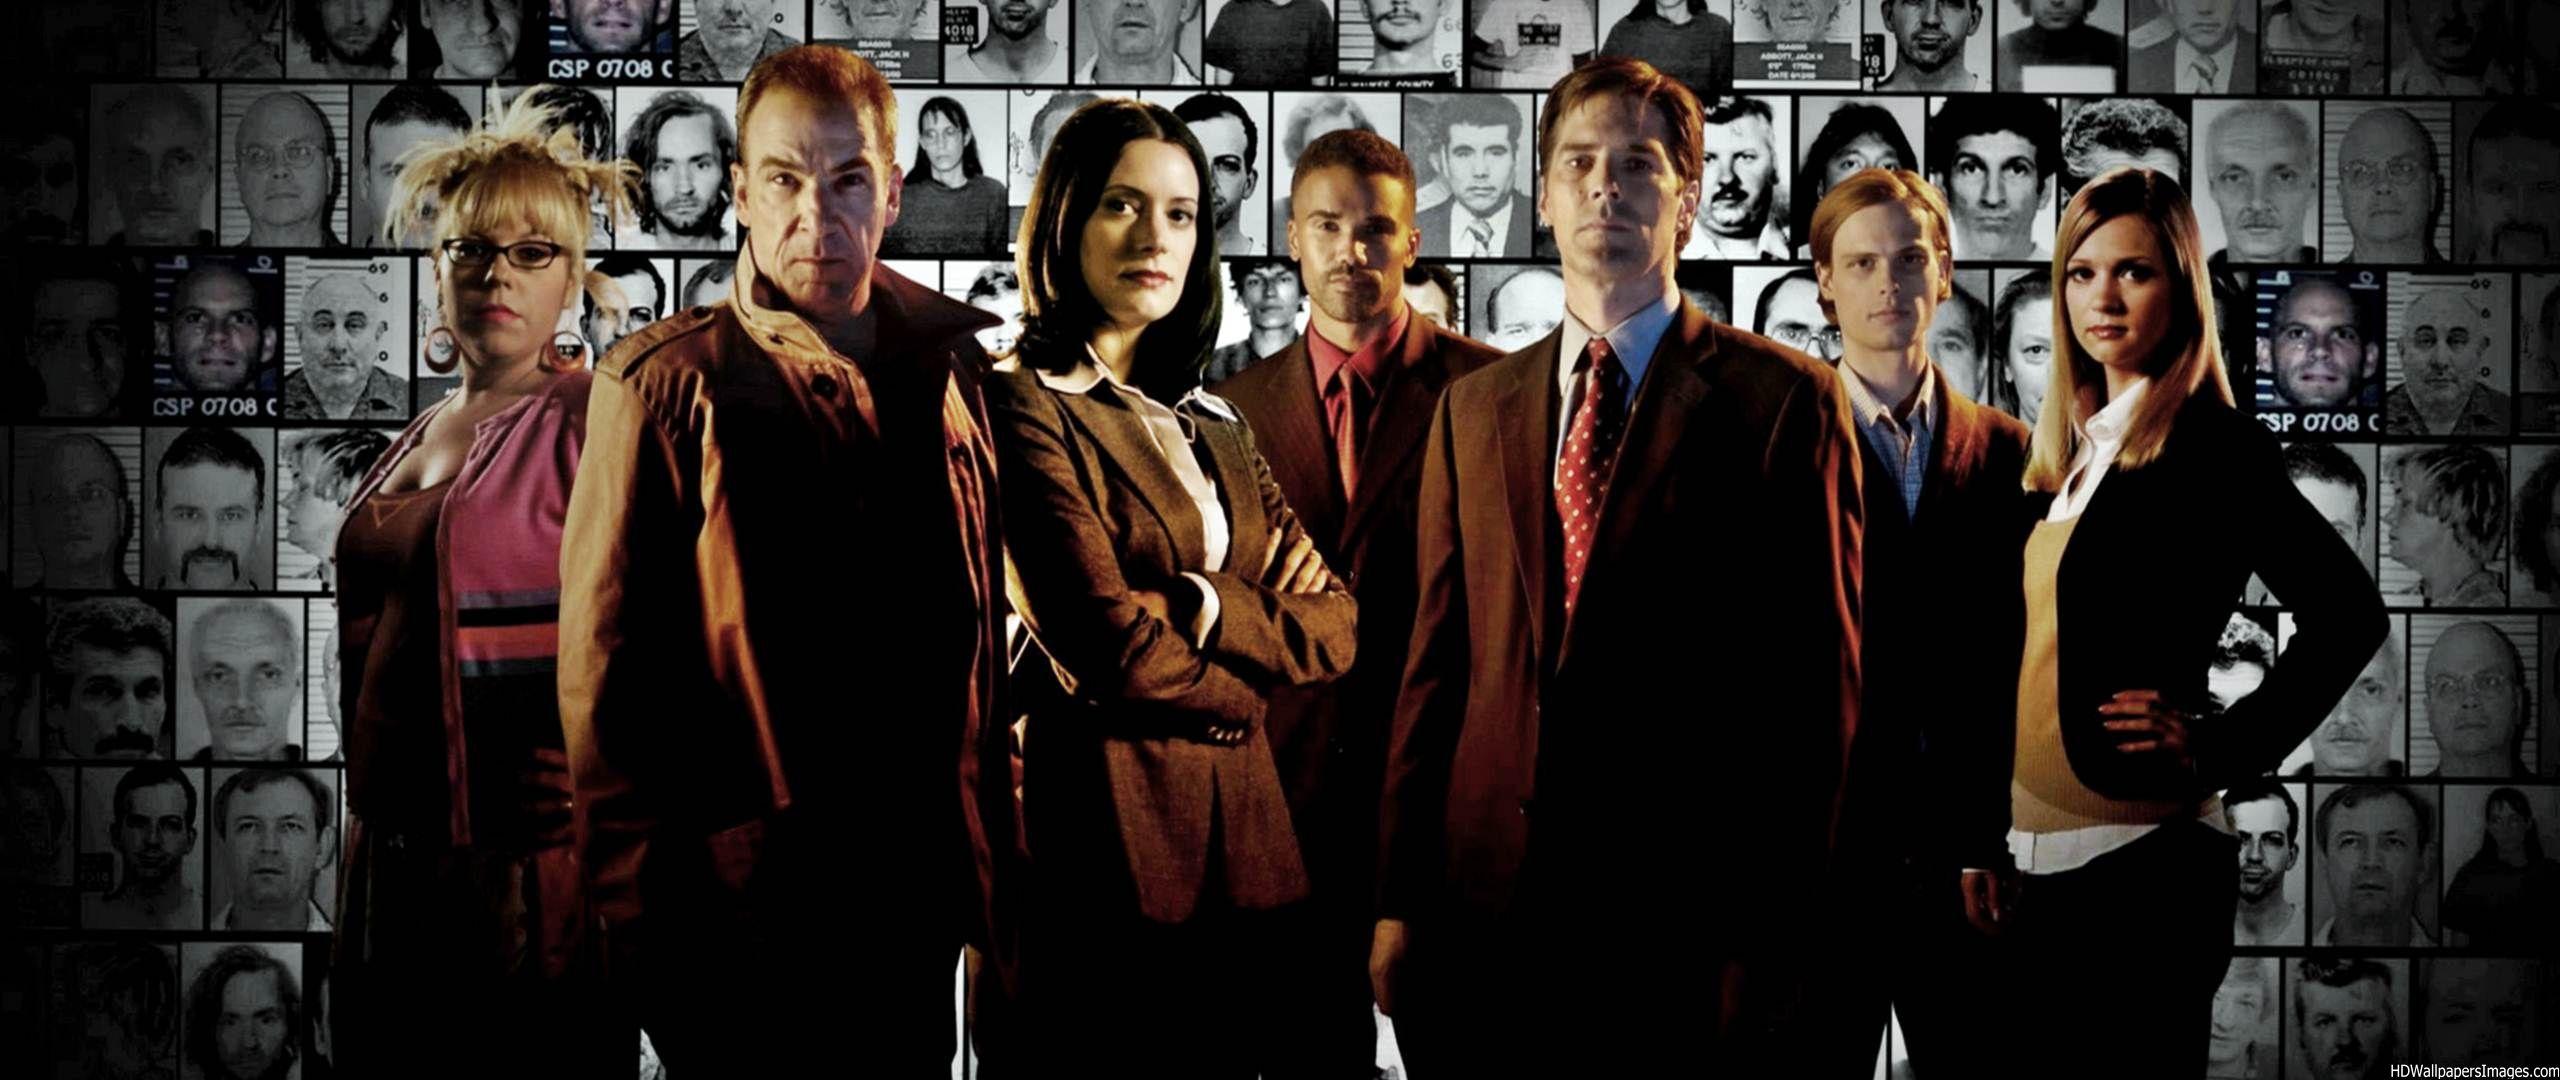 criminal minds theme song movie theme songs tv soundtracks